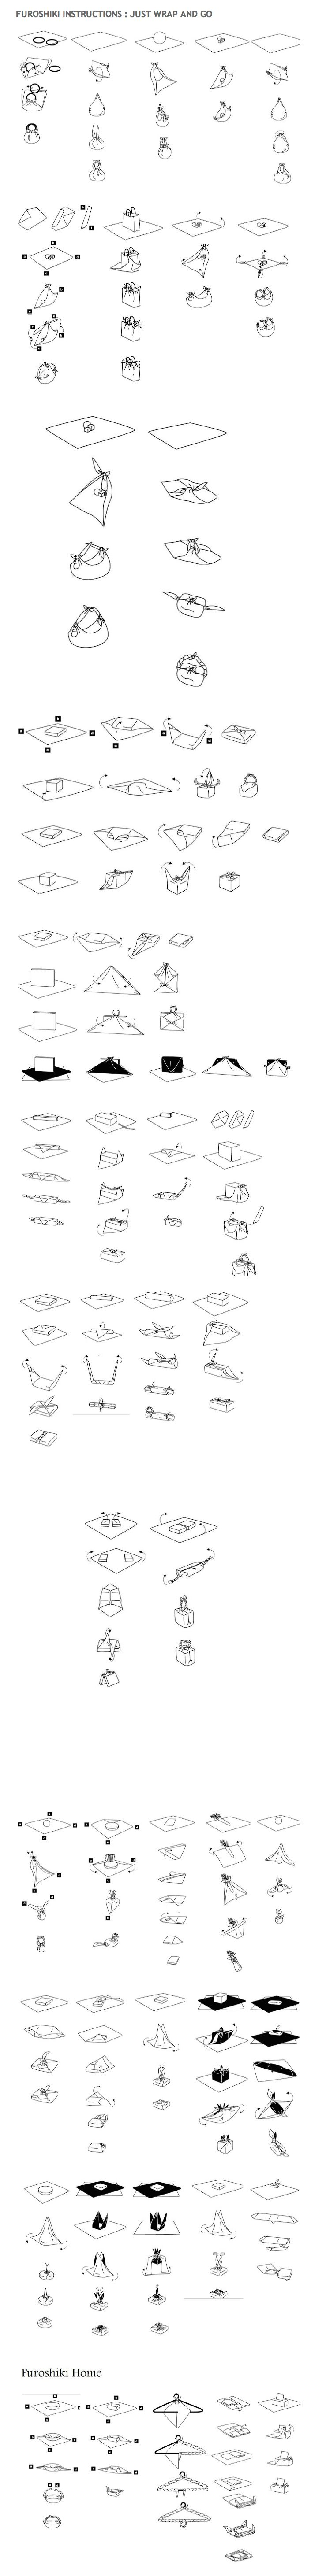 http://projectfidgetyfingers.blogspot.com/2011/07/furoshiki-instructions-just-wrap-and-go.html